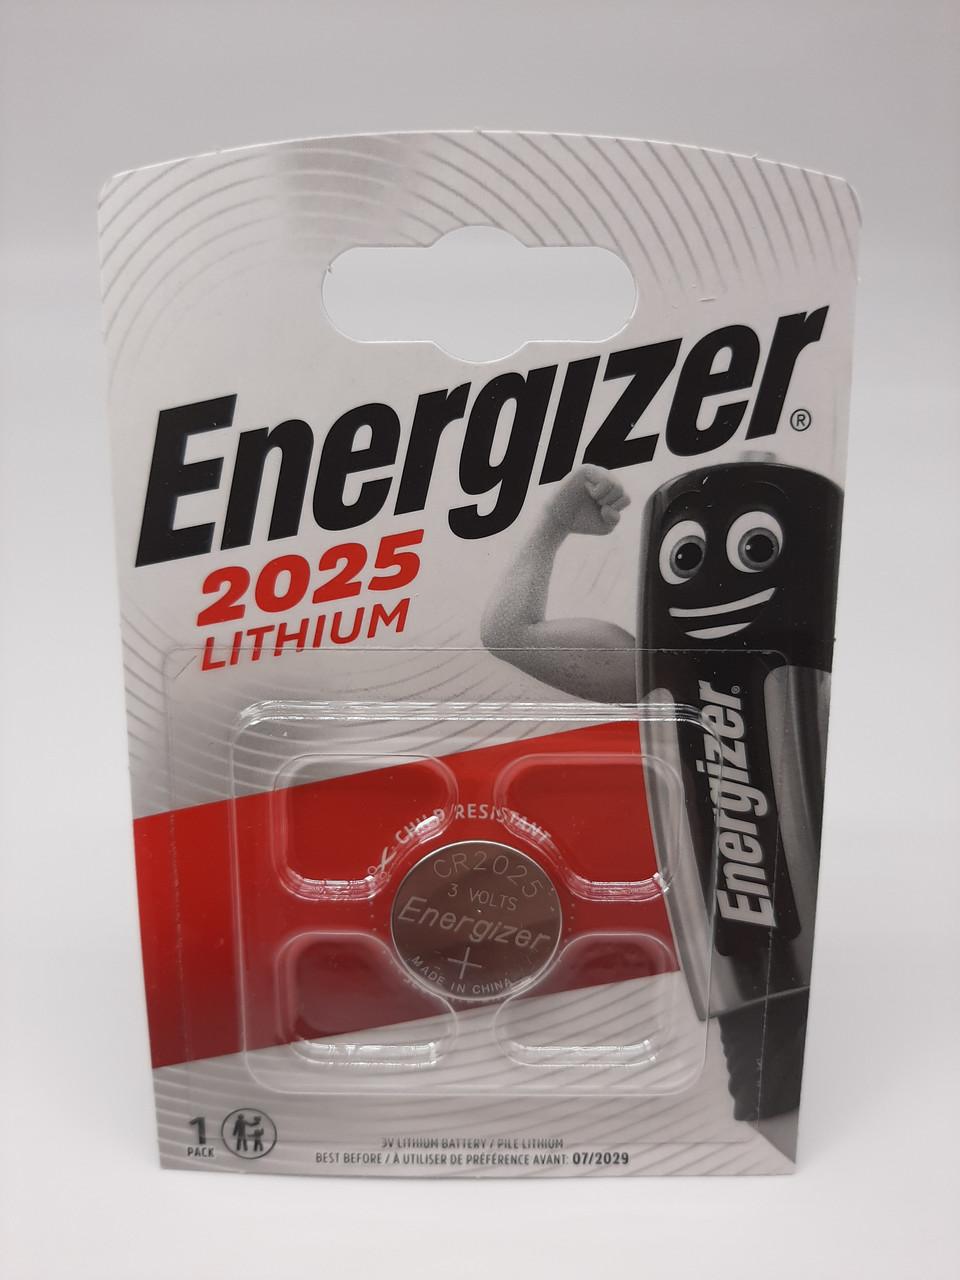 Батарейка для часов. Energizer CR2025 3.0V 140mAh 20x2.5mm. Литиевая